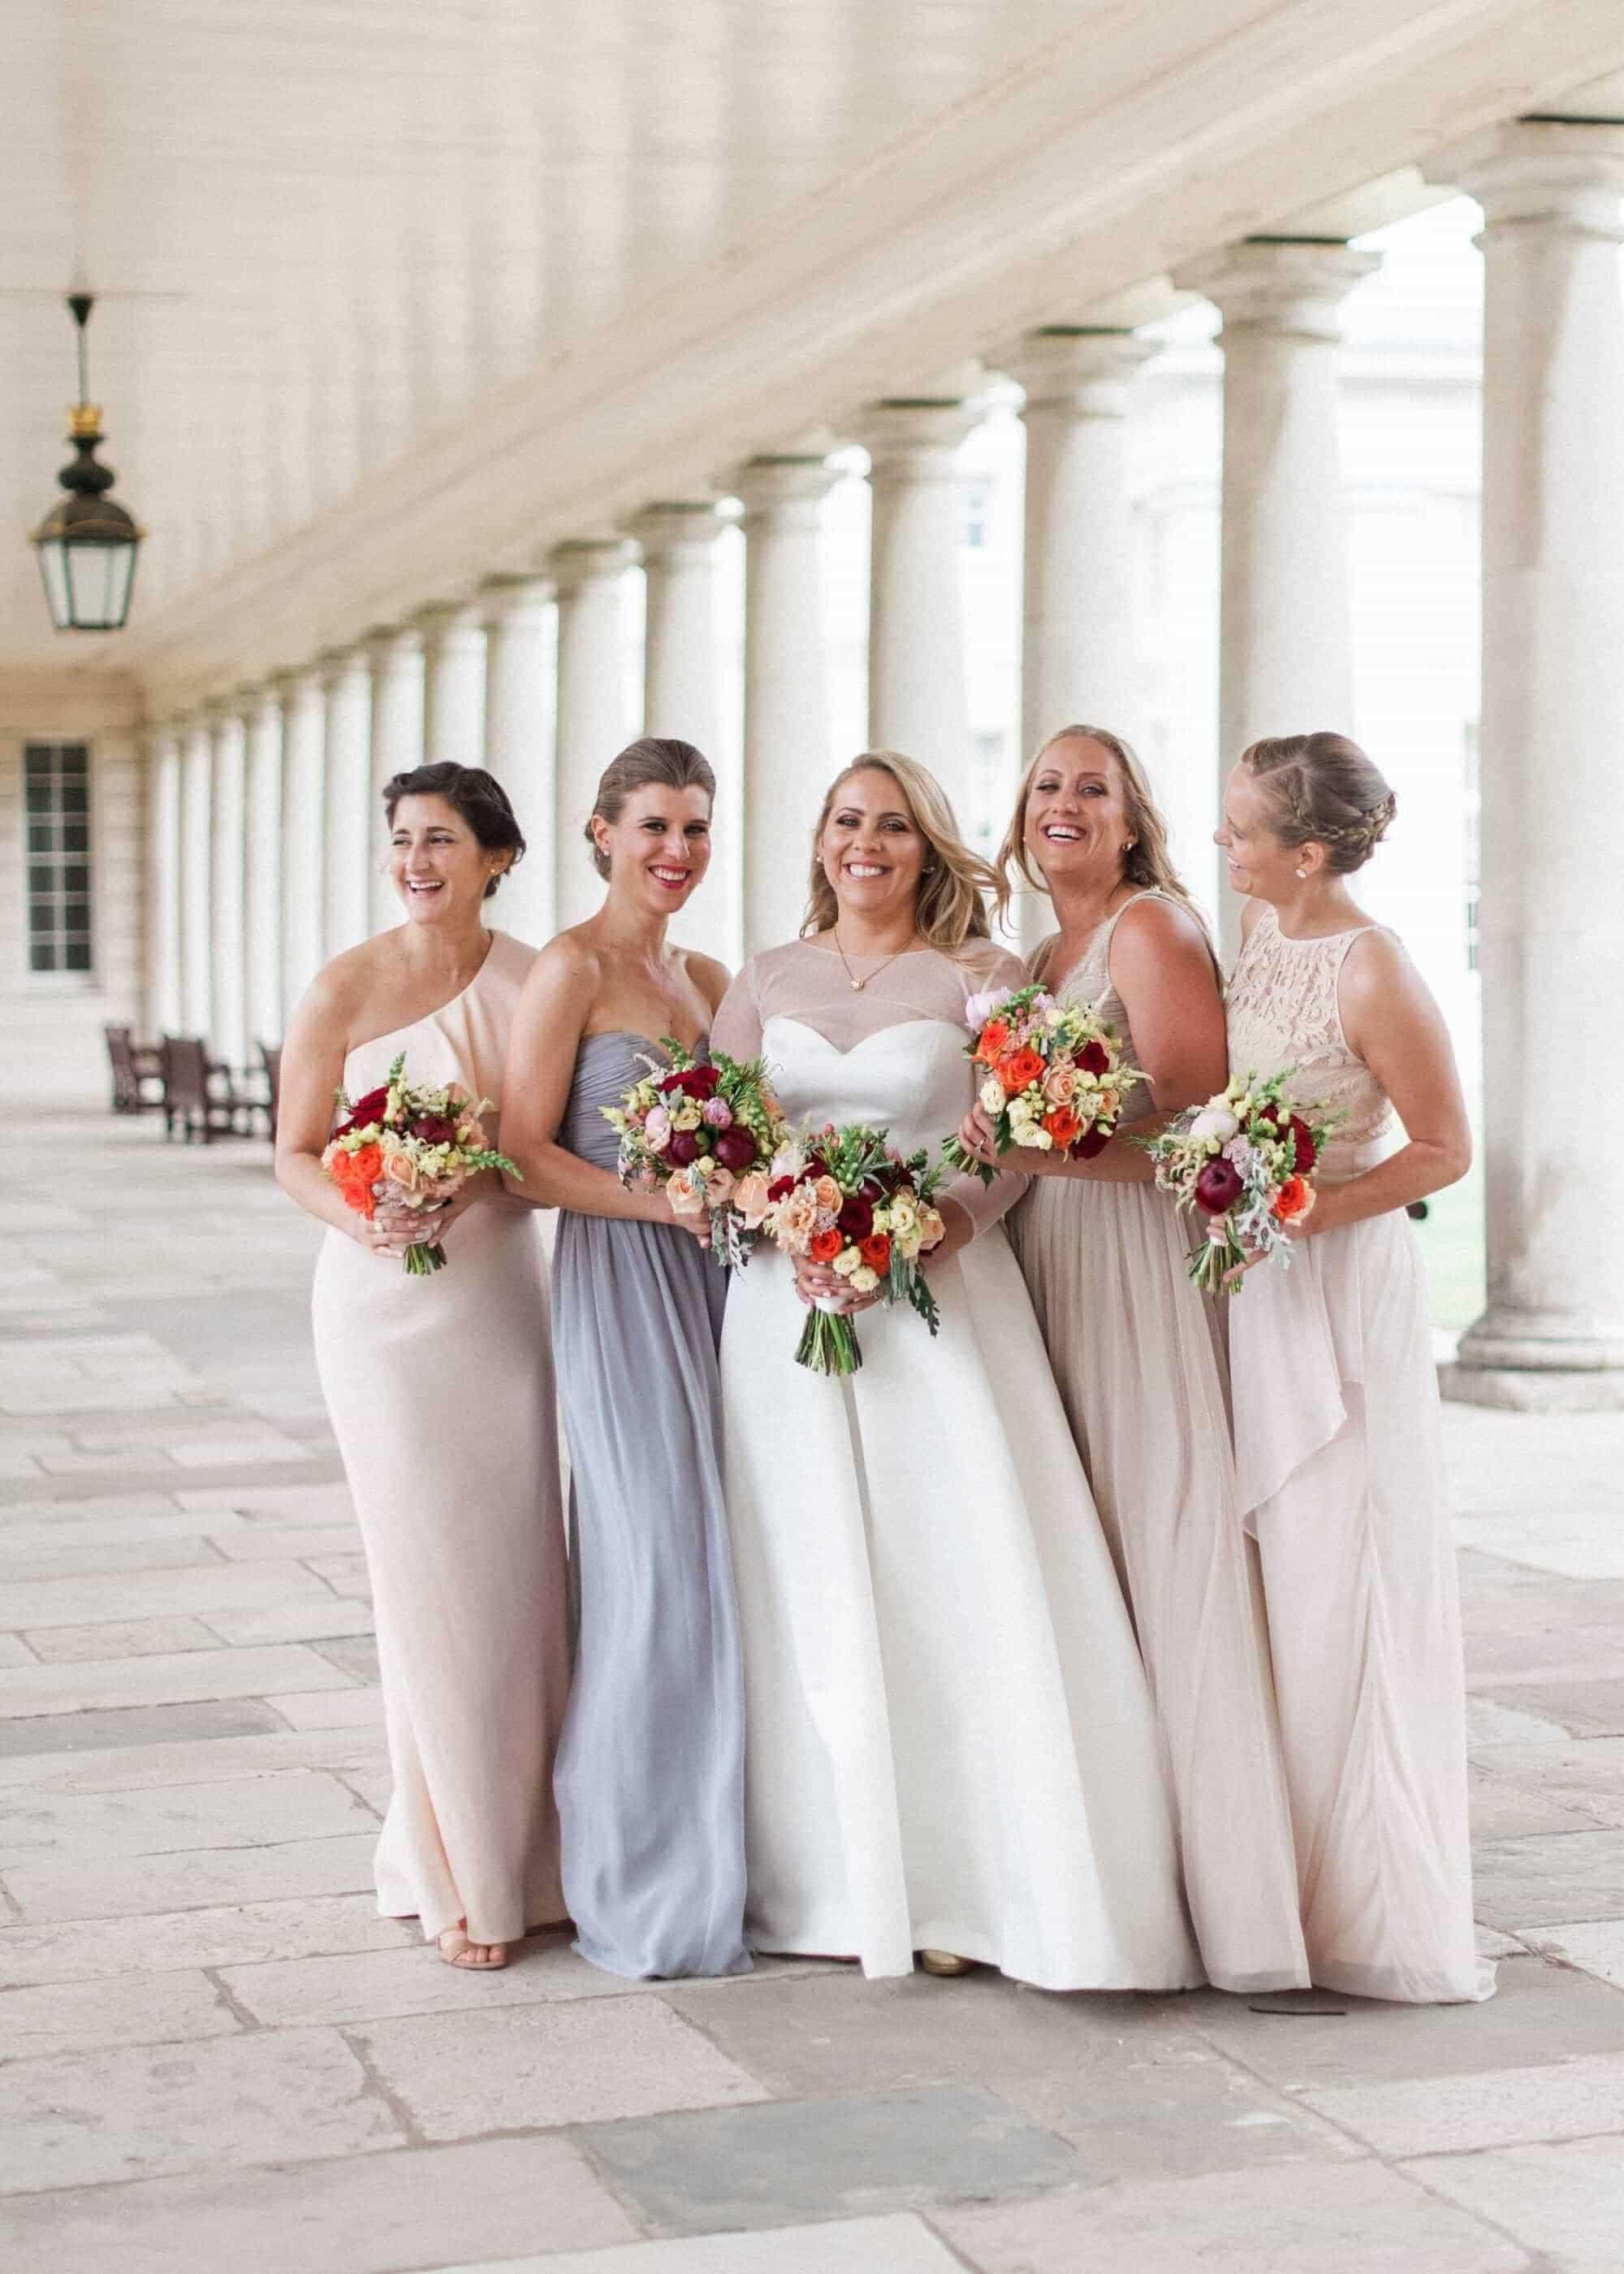 Kate Nielen Photography 86 - Luxury Wedding Gallery